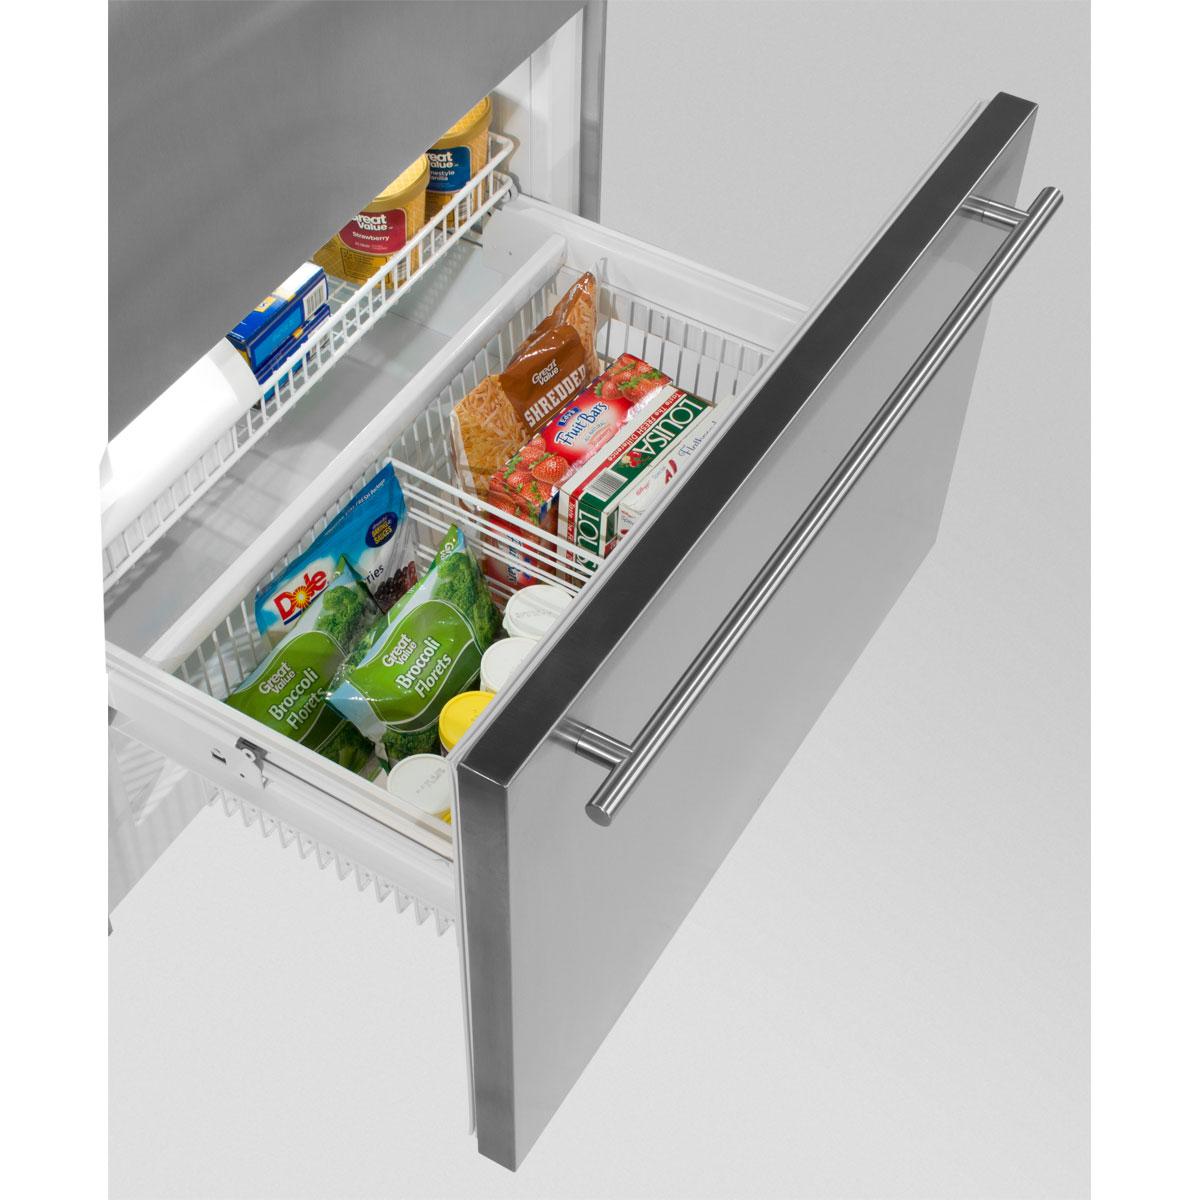 "Model: MP36BF2LP | Marvel  Marvel Professional Built-In 36"" Bottom Freezer Refrigerator- Panel-Ready Solid Overlay Door Left Hinge"